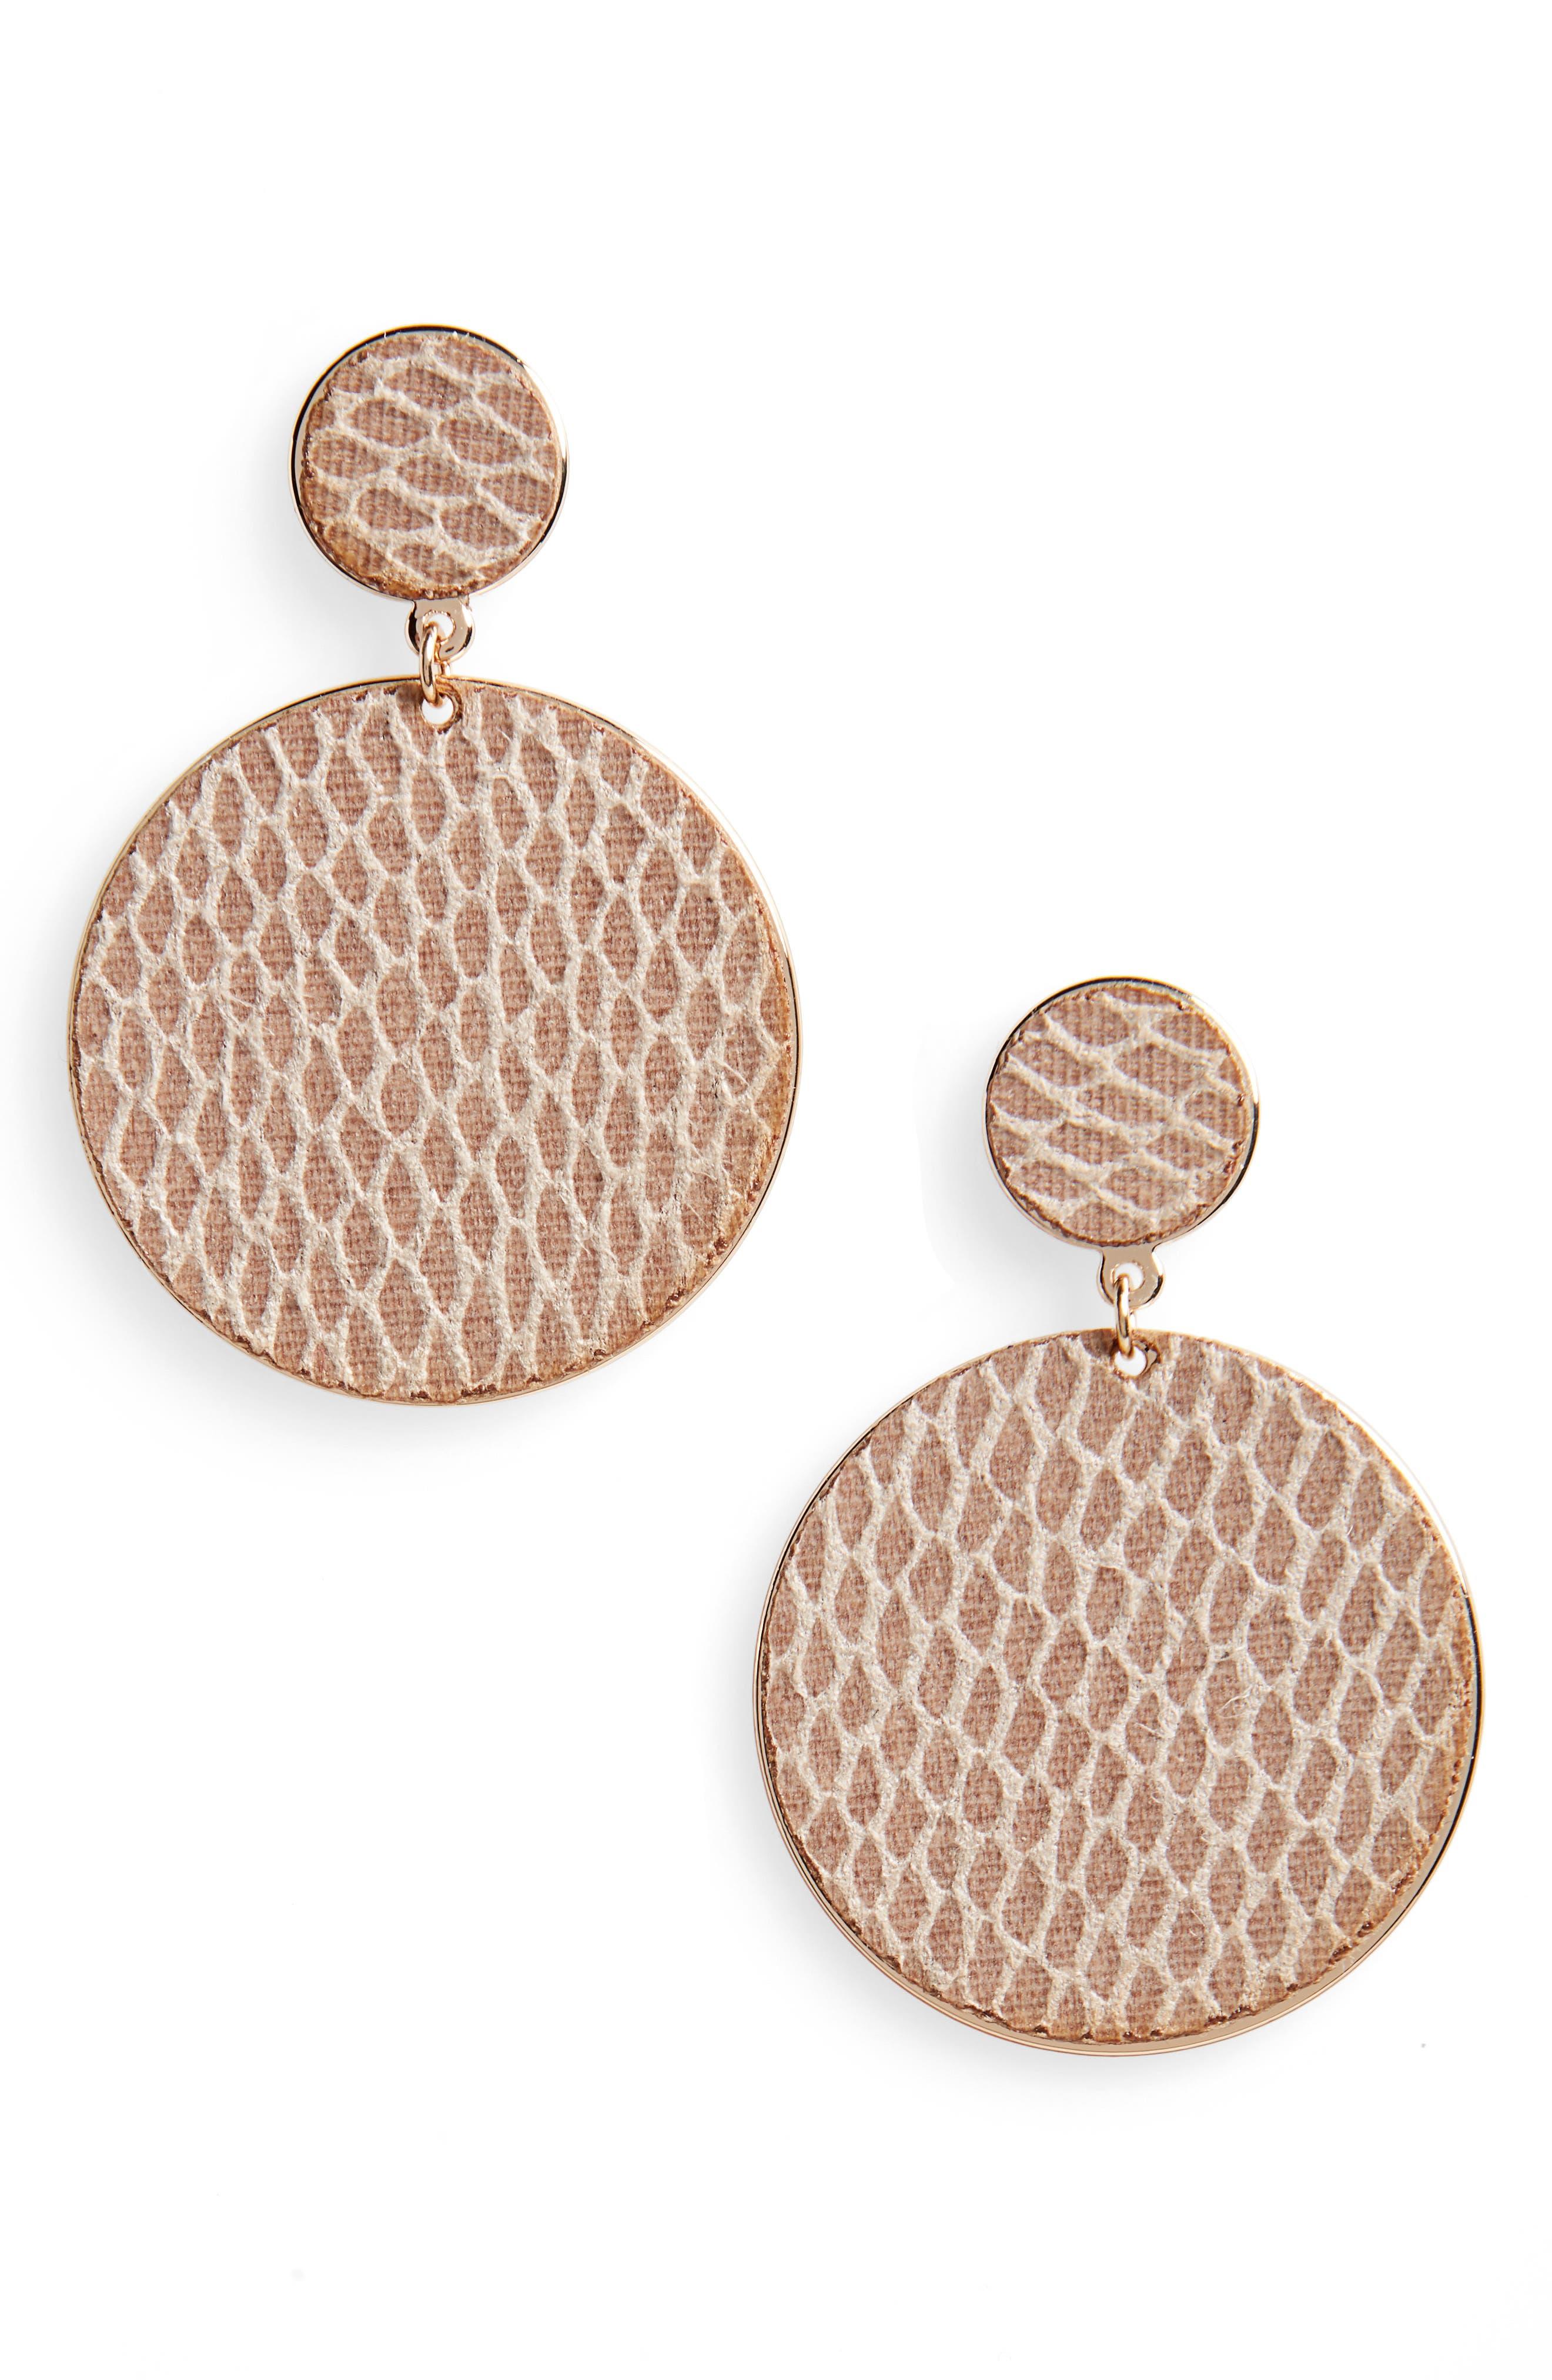 Mesh Texture Graduated Disc Earrings,                             Main thumbnail 1, color,                             Gold/ Natural